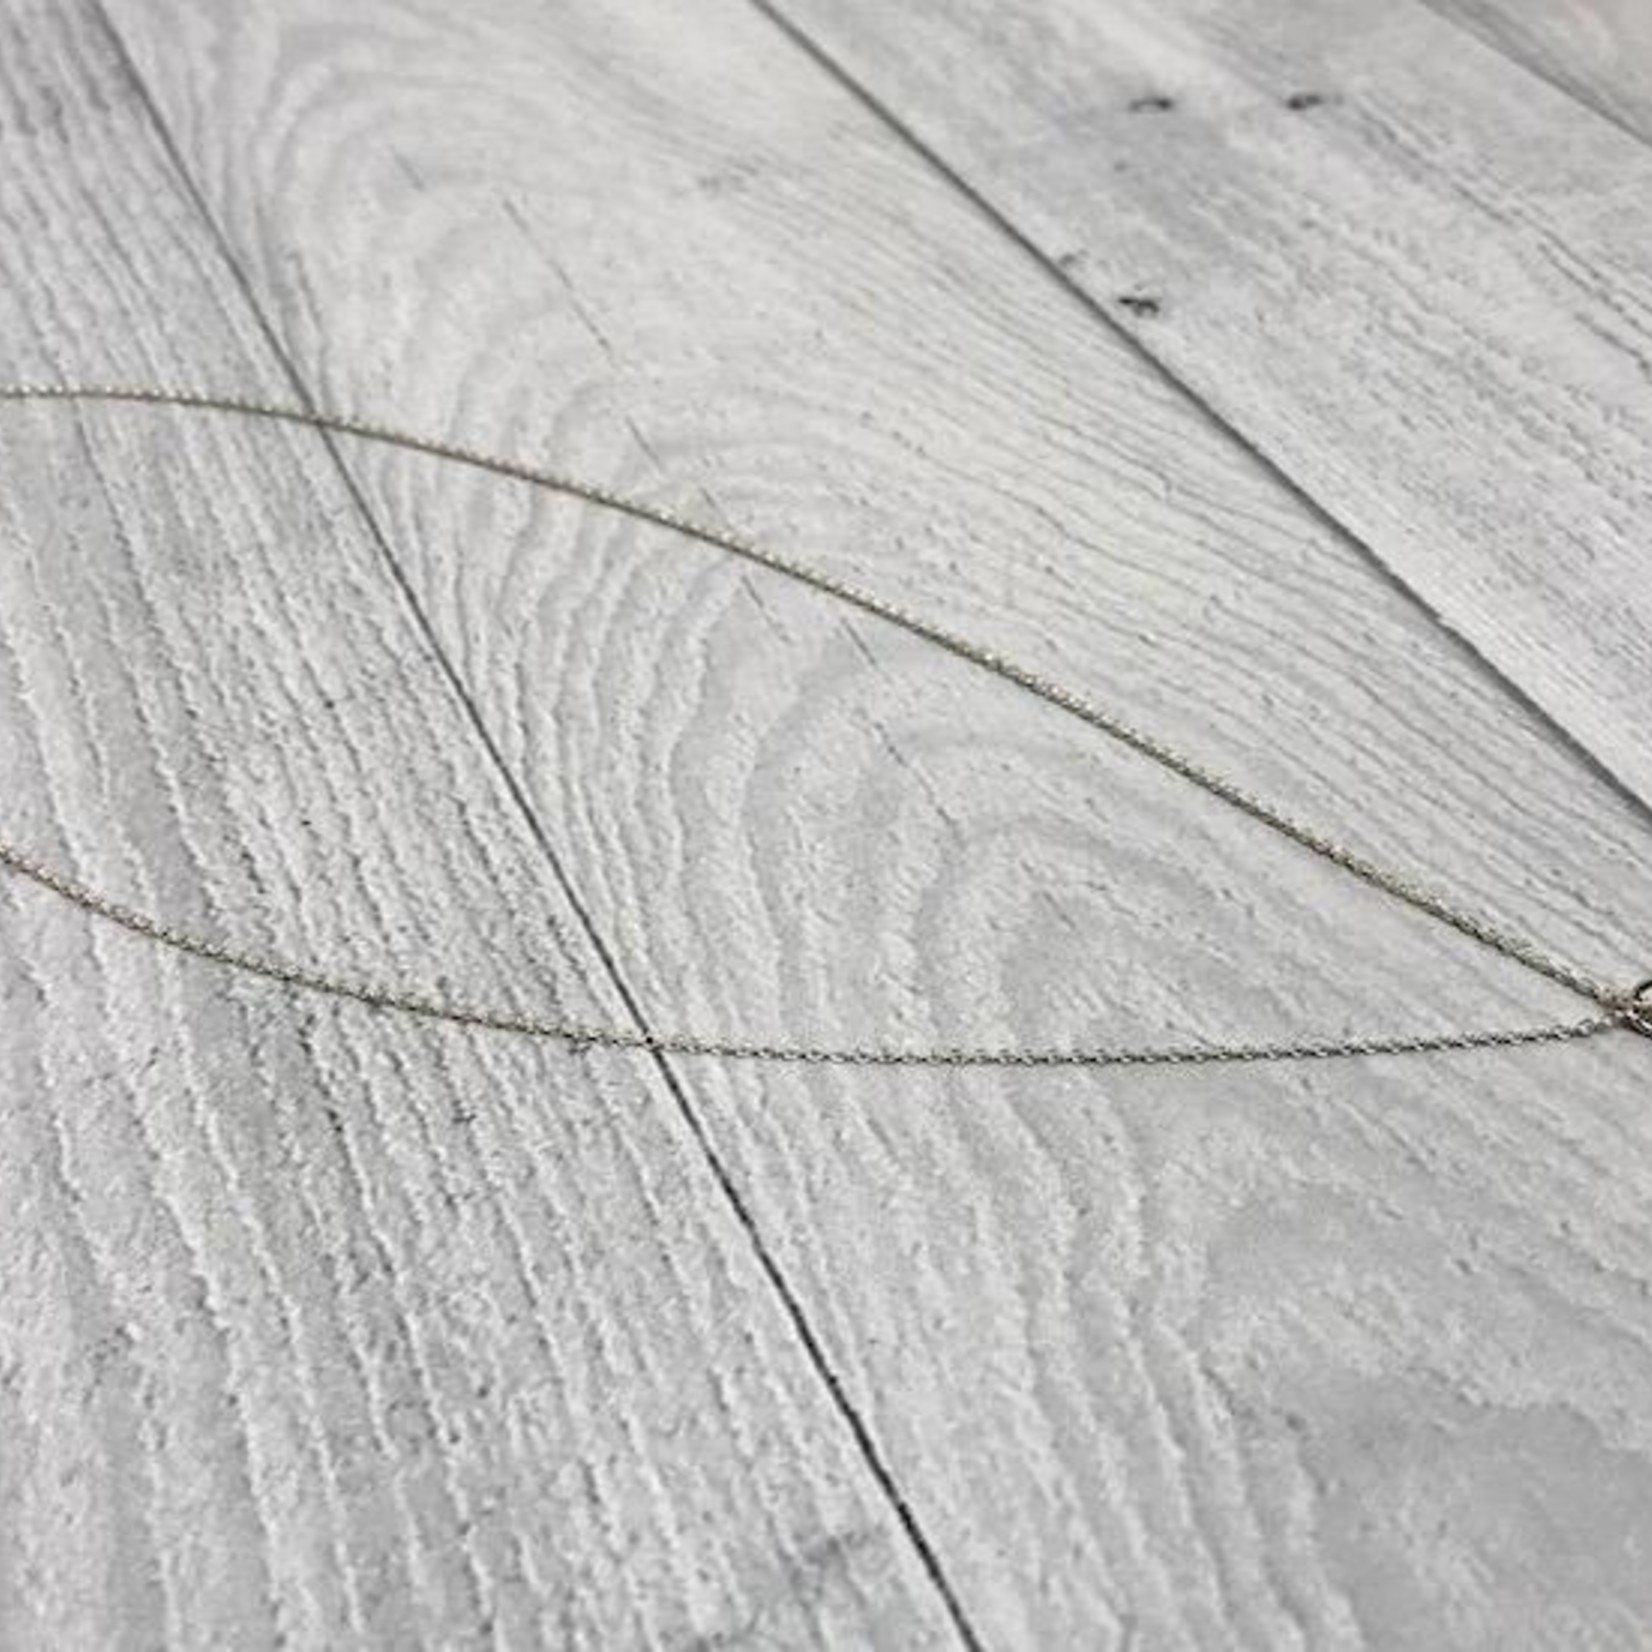 "Sterling Silver Wink (Small Diamond Shape) Necklace (16"")"